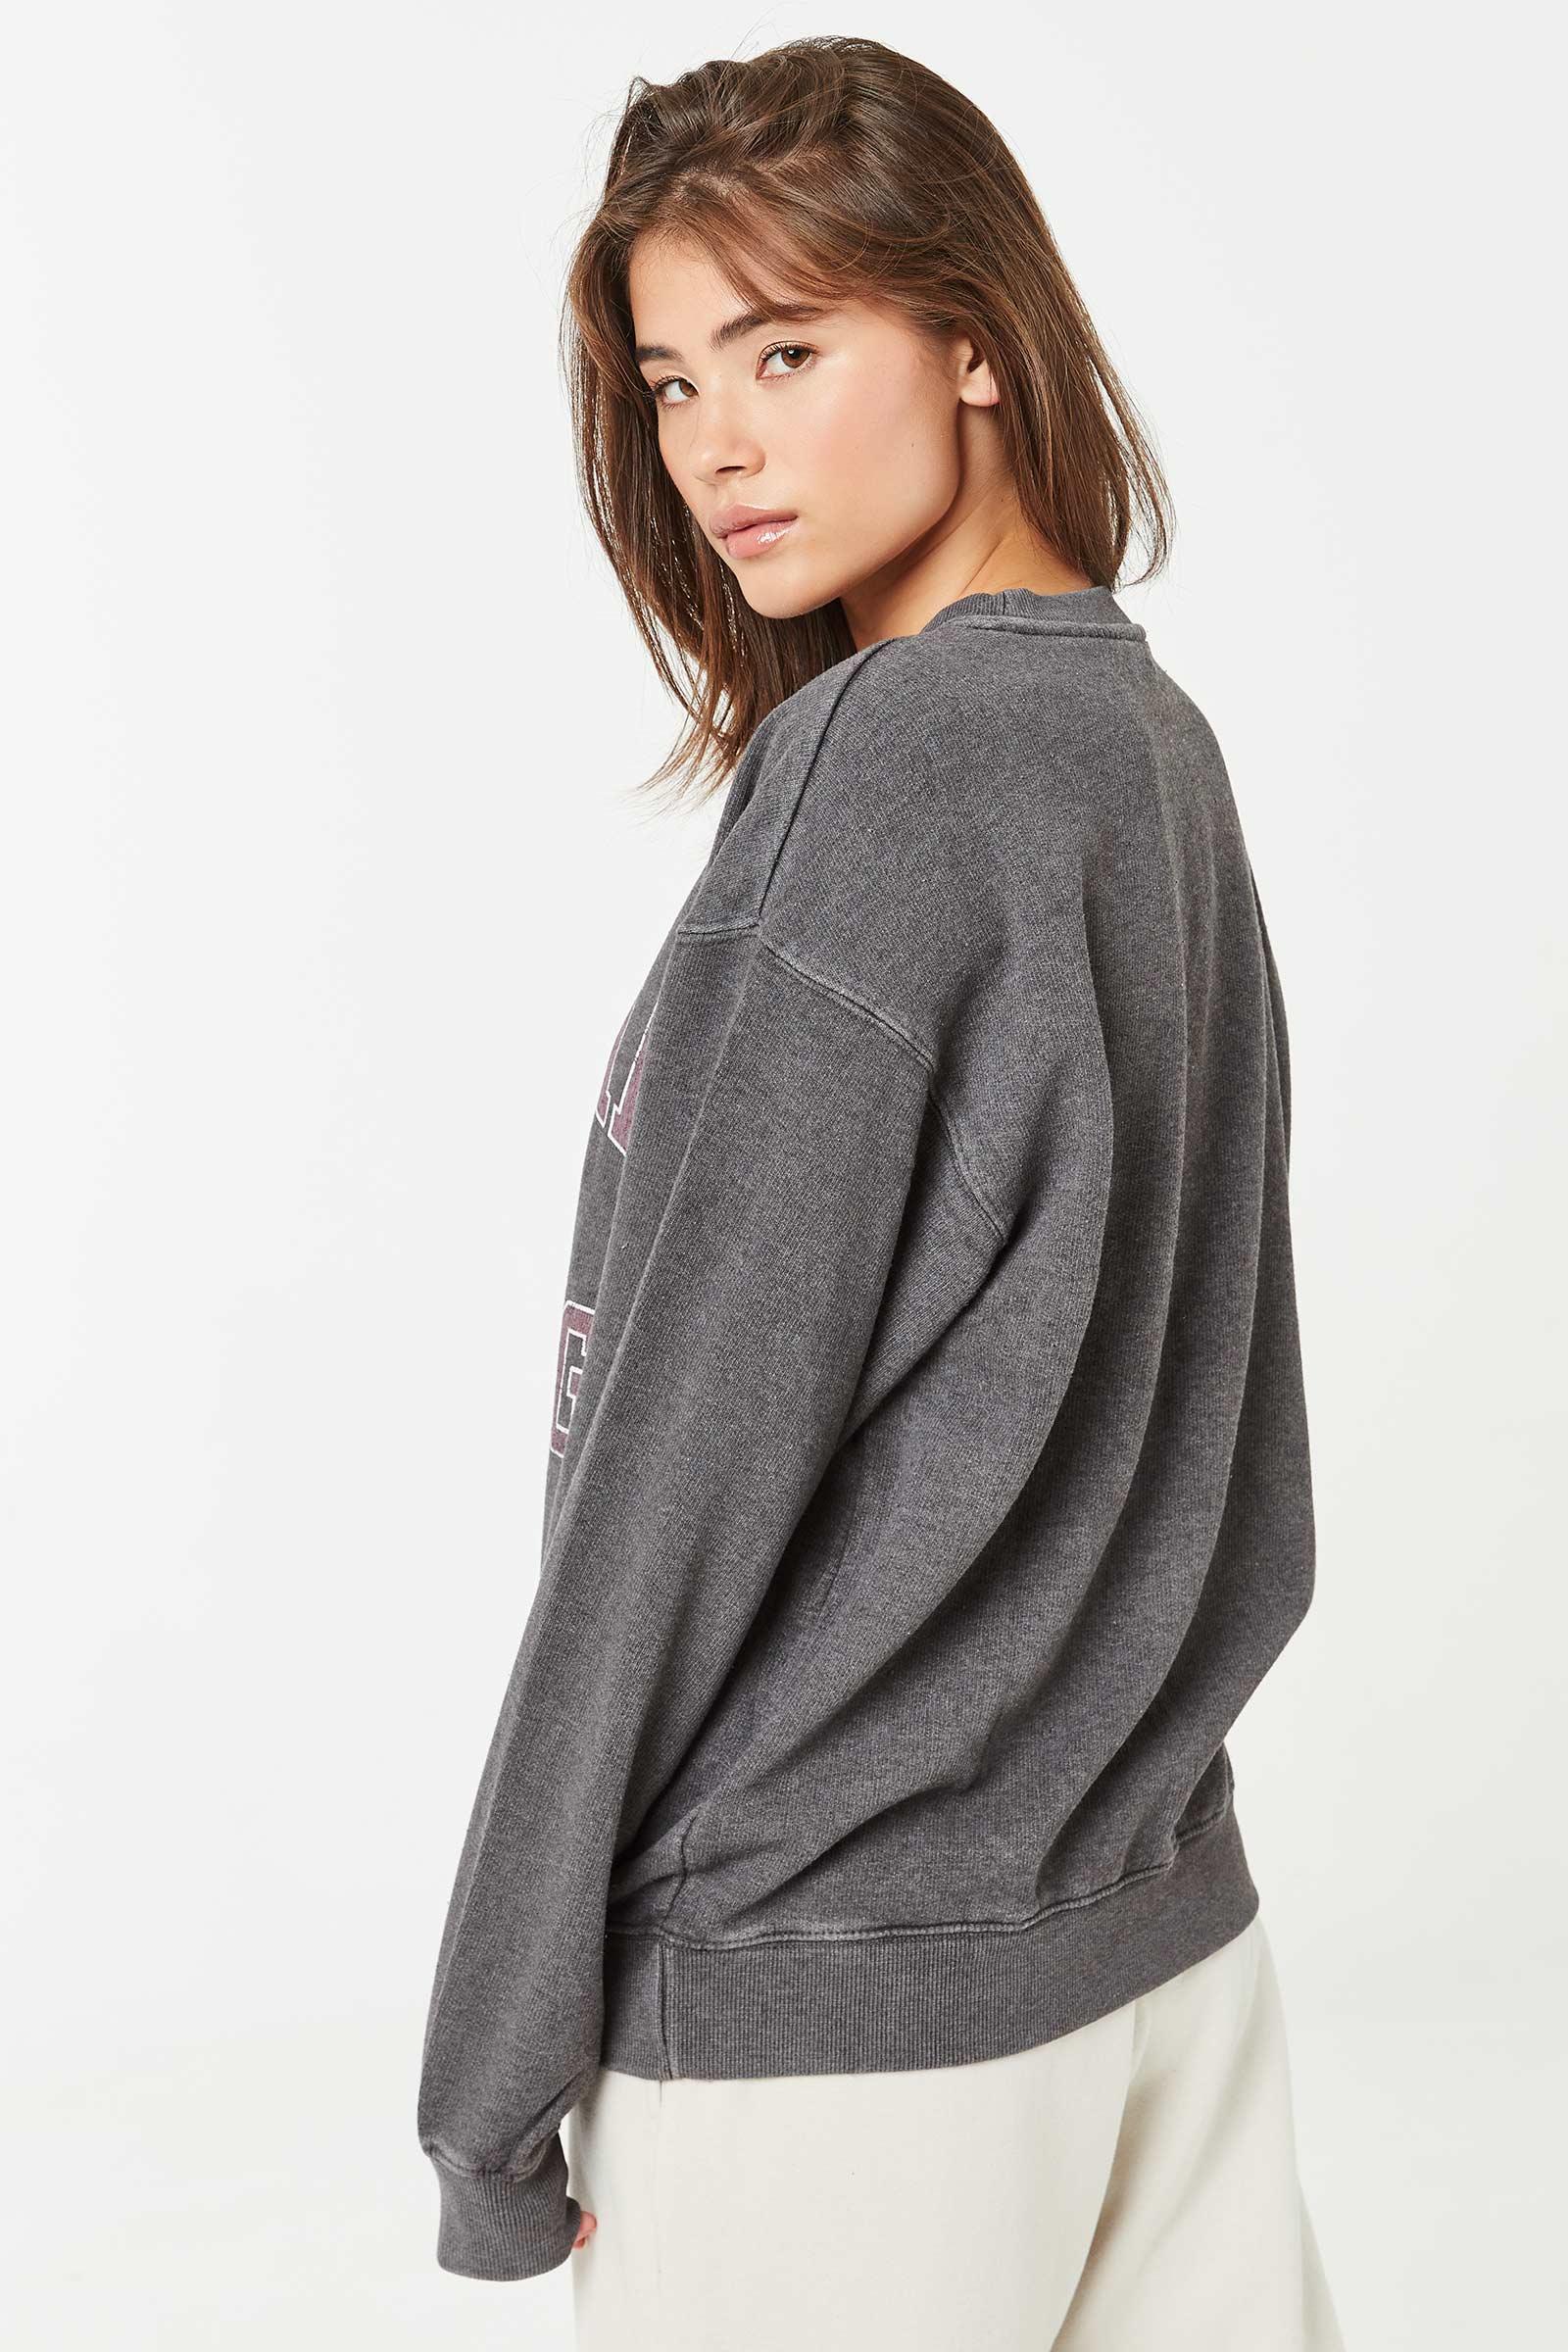 Indiana Crew-Neck Sweatshirt